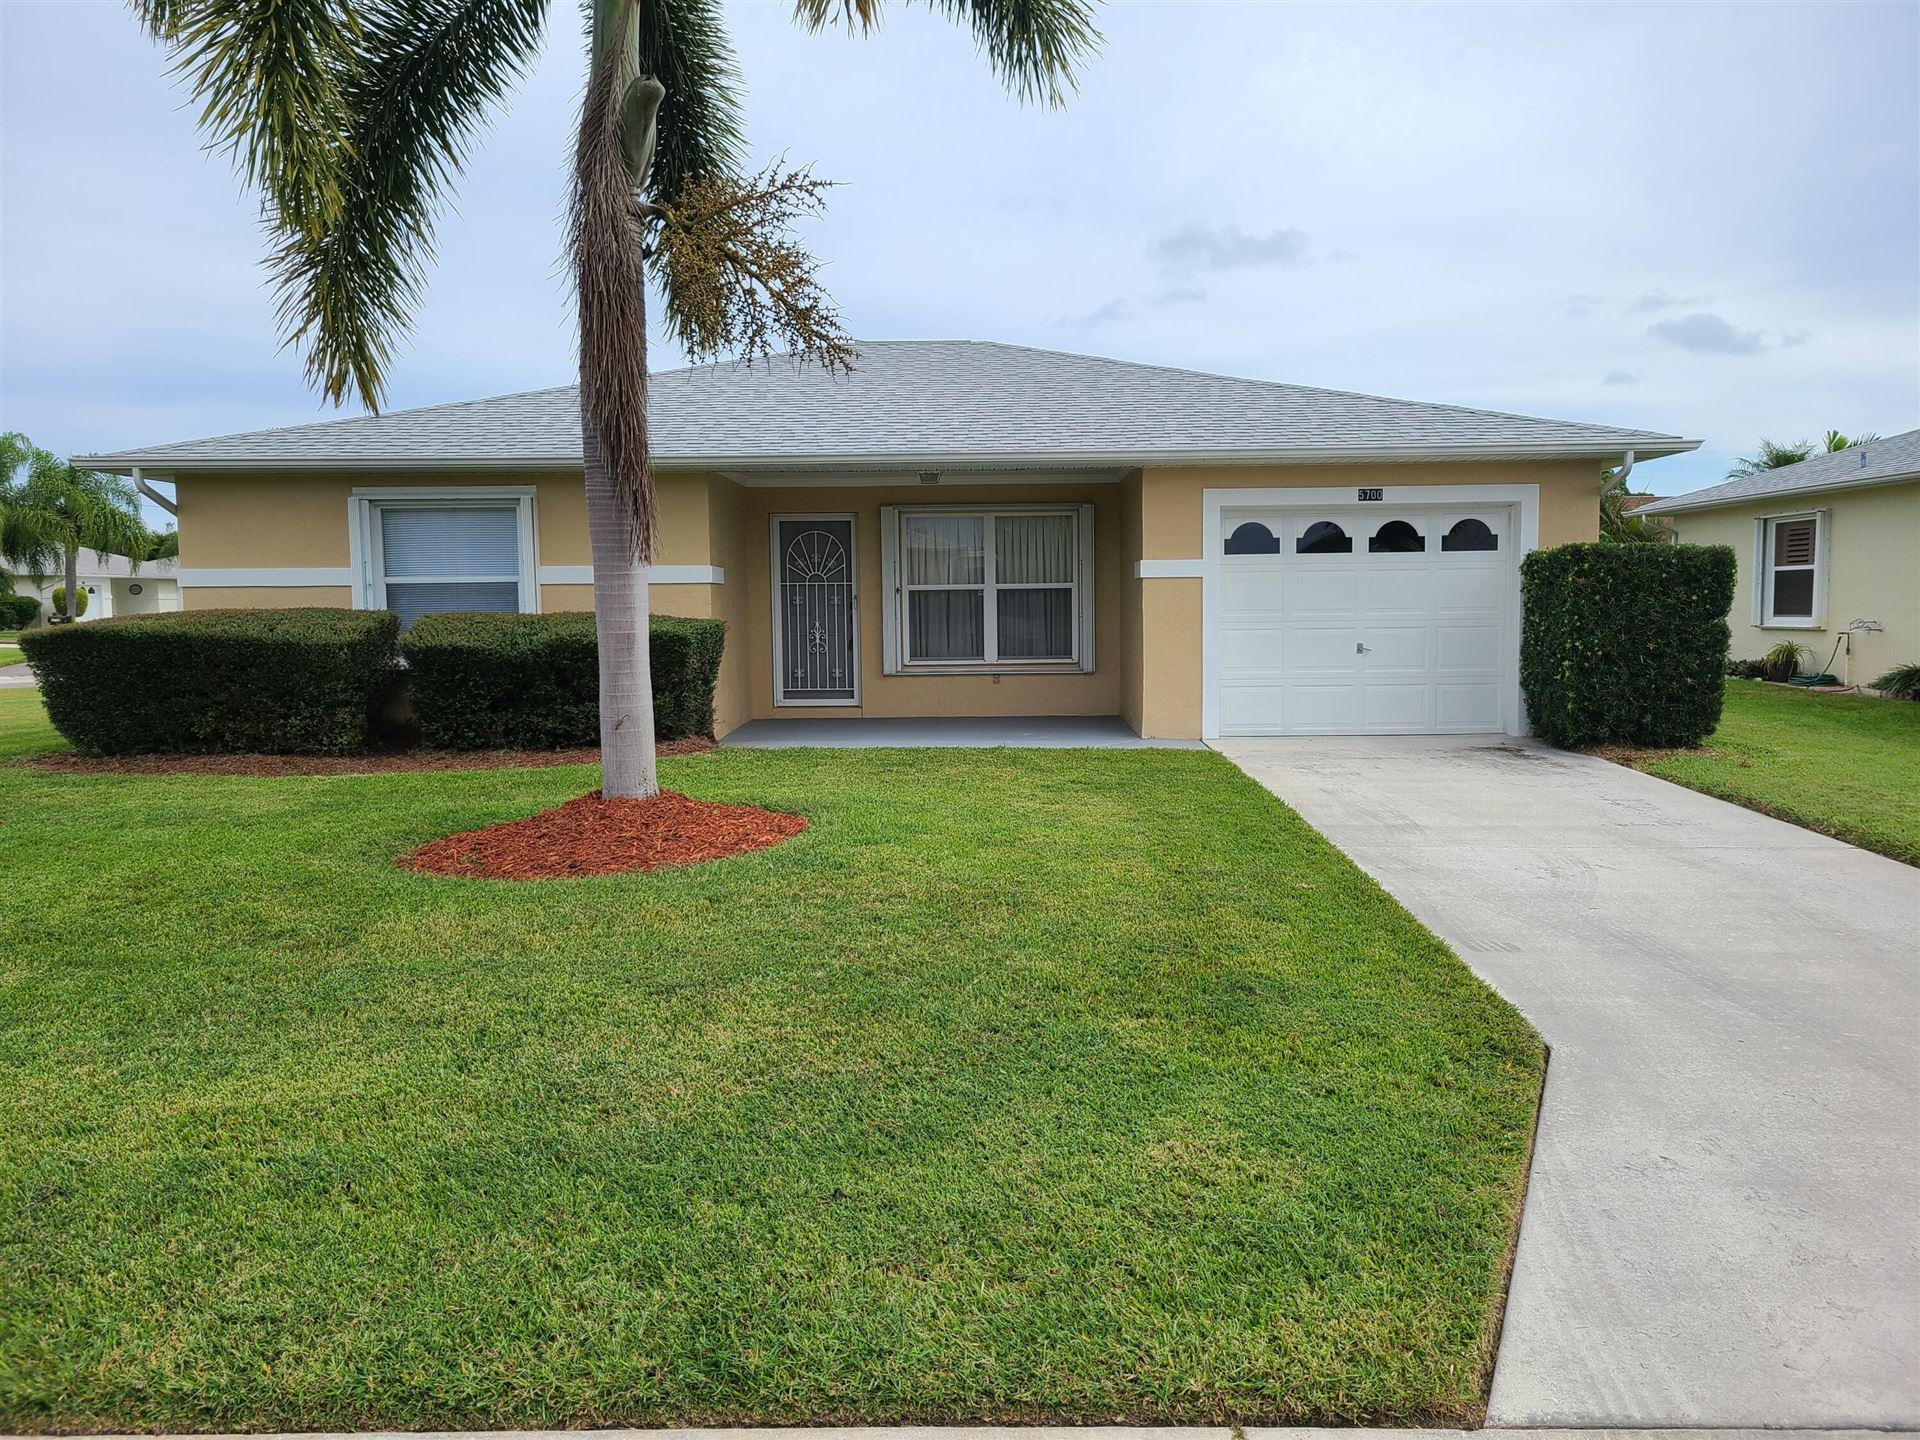 5700 Thatch Place, Fort Pierce, FL 34982 - MLS#: RX-10754203